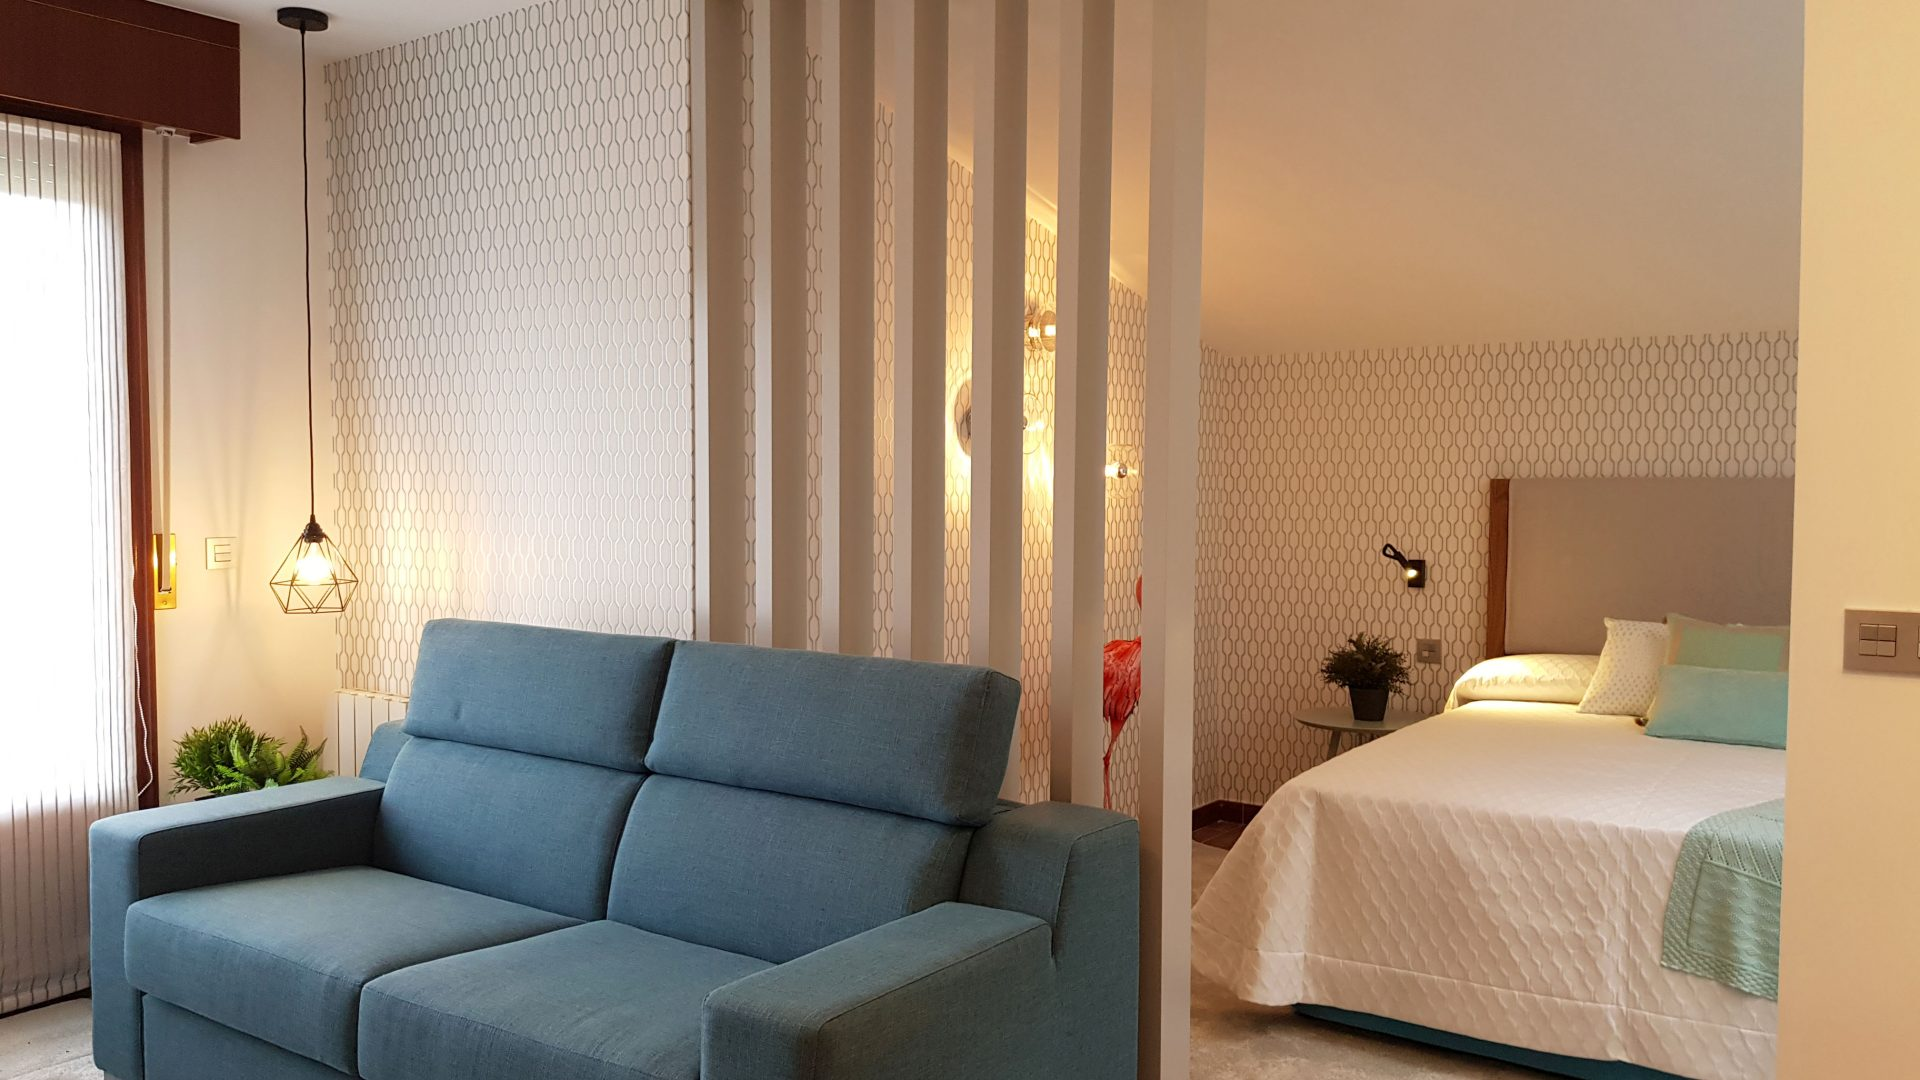 mugarri-decoracion-habitacion-suite-vestidor-bizkaia 01